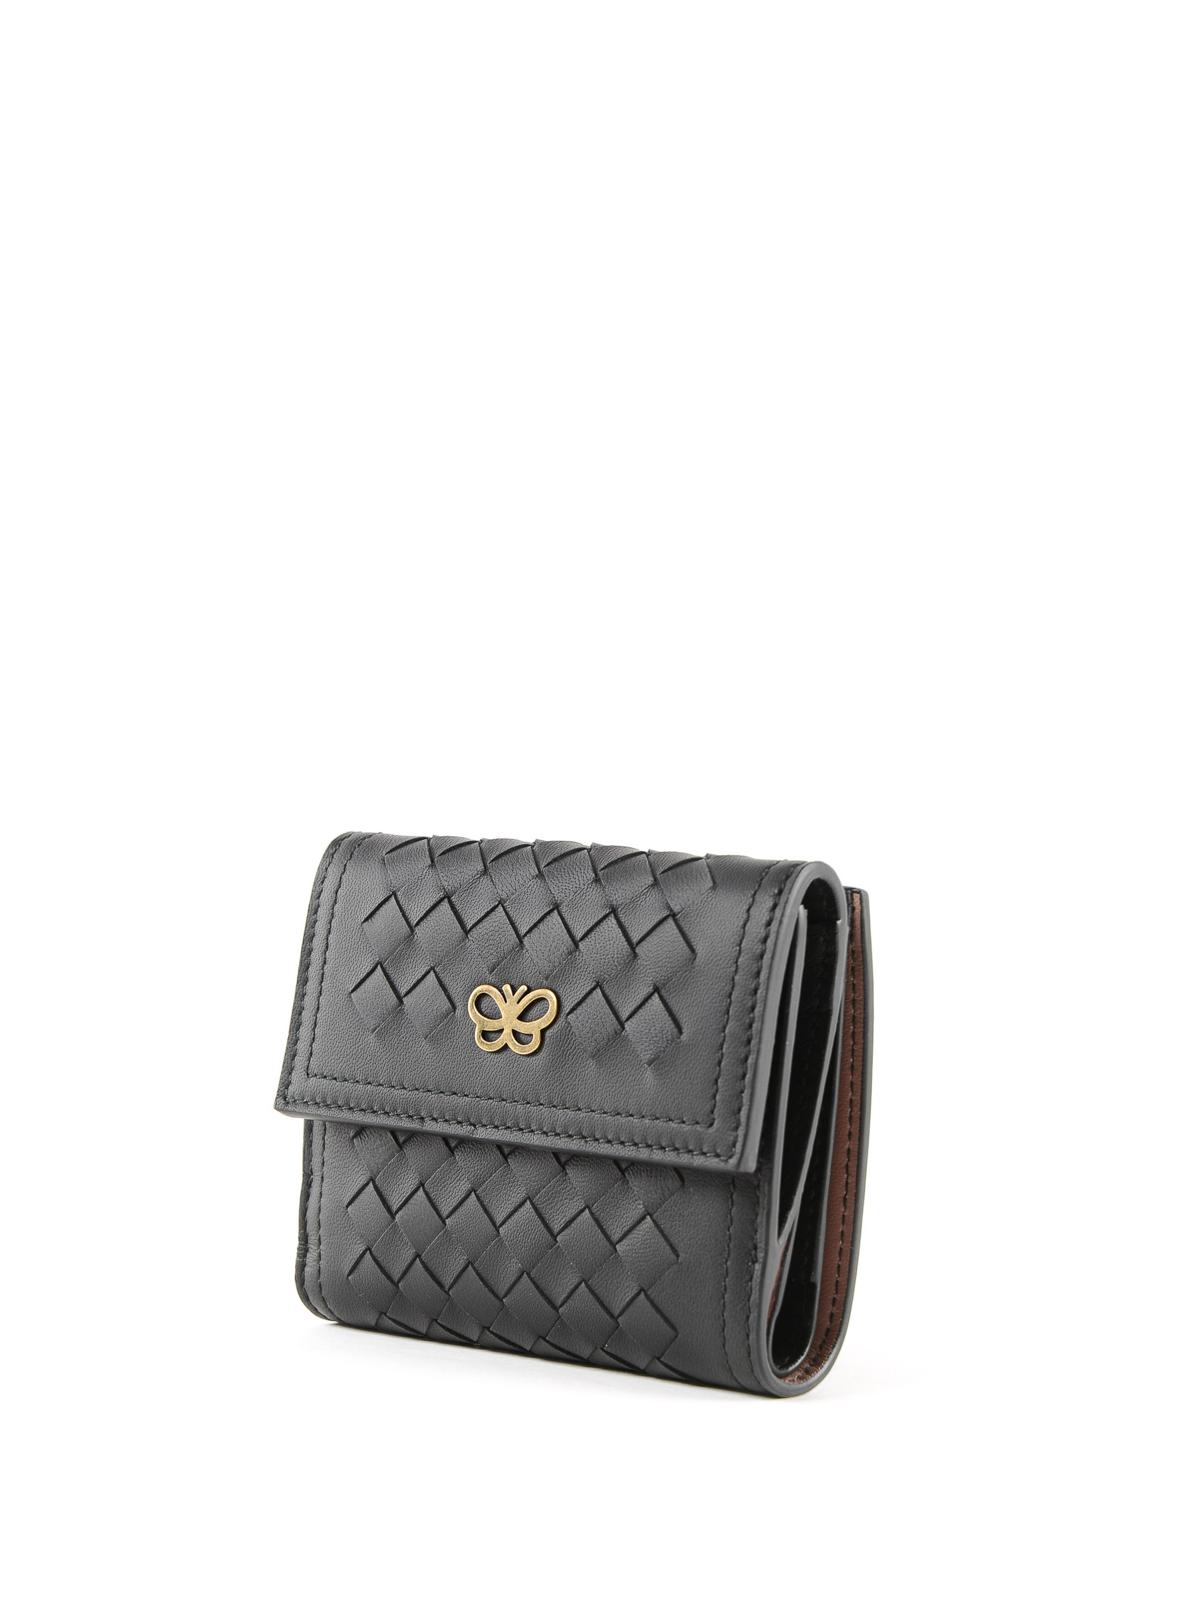 b54eae6441 BOTTEGA VENETA: portafogli online - Mini portafoglio nero in pelle  intrecciata